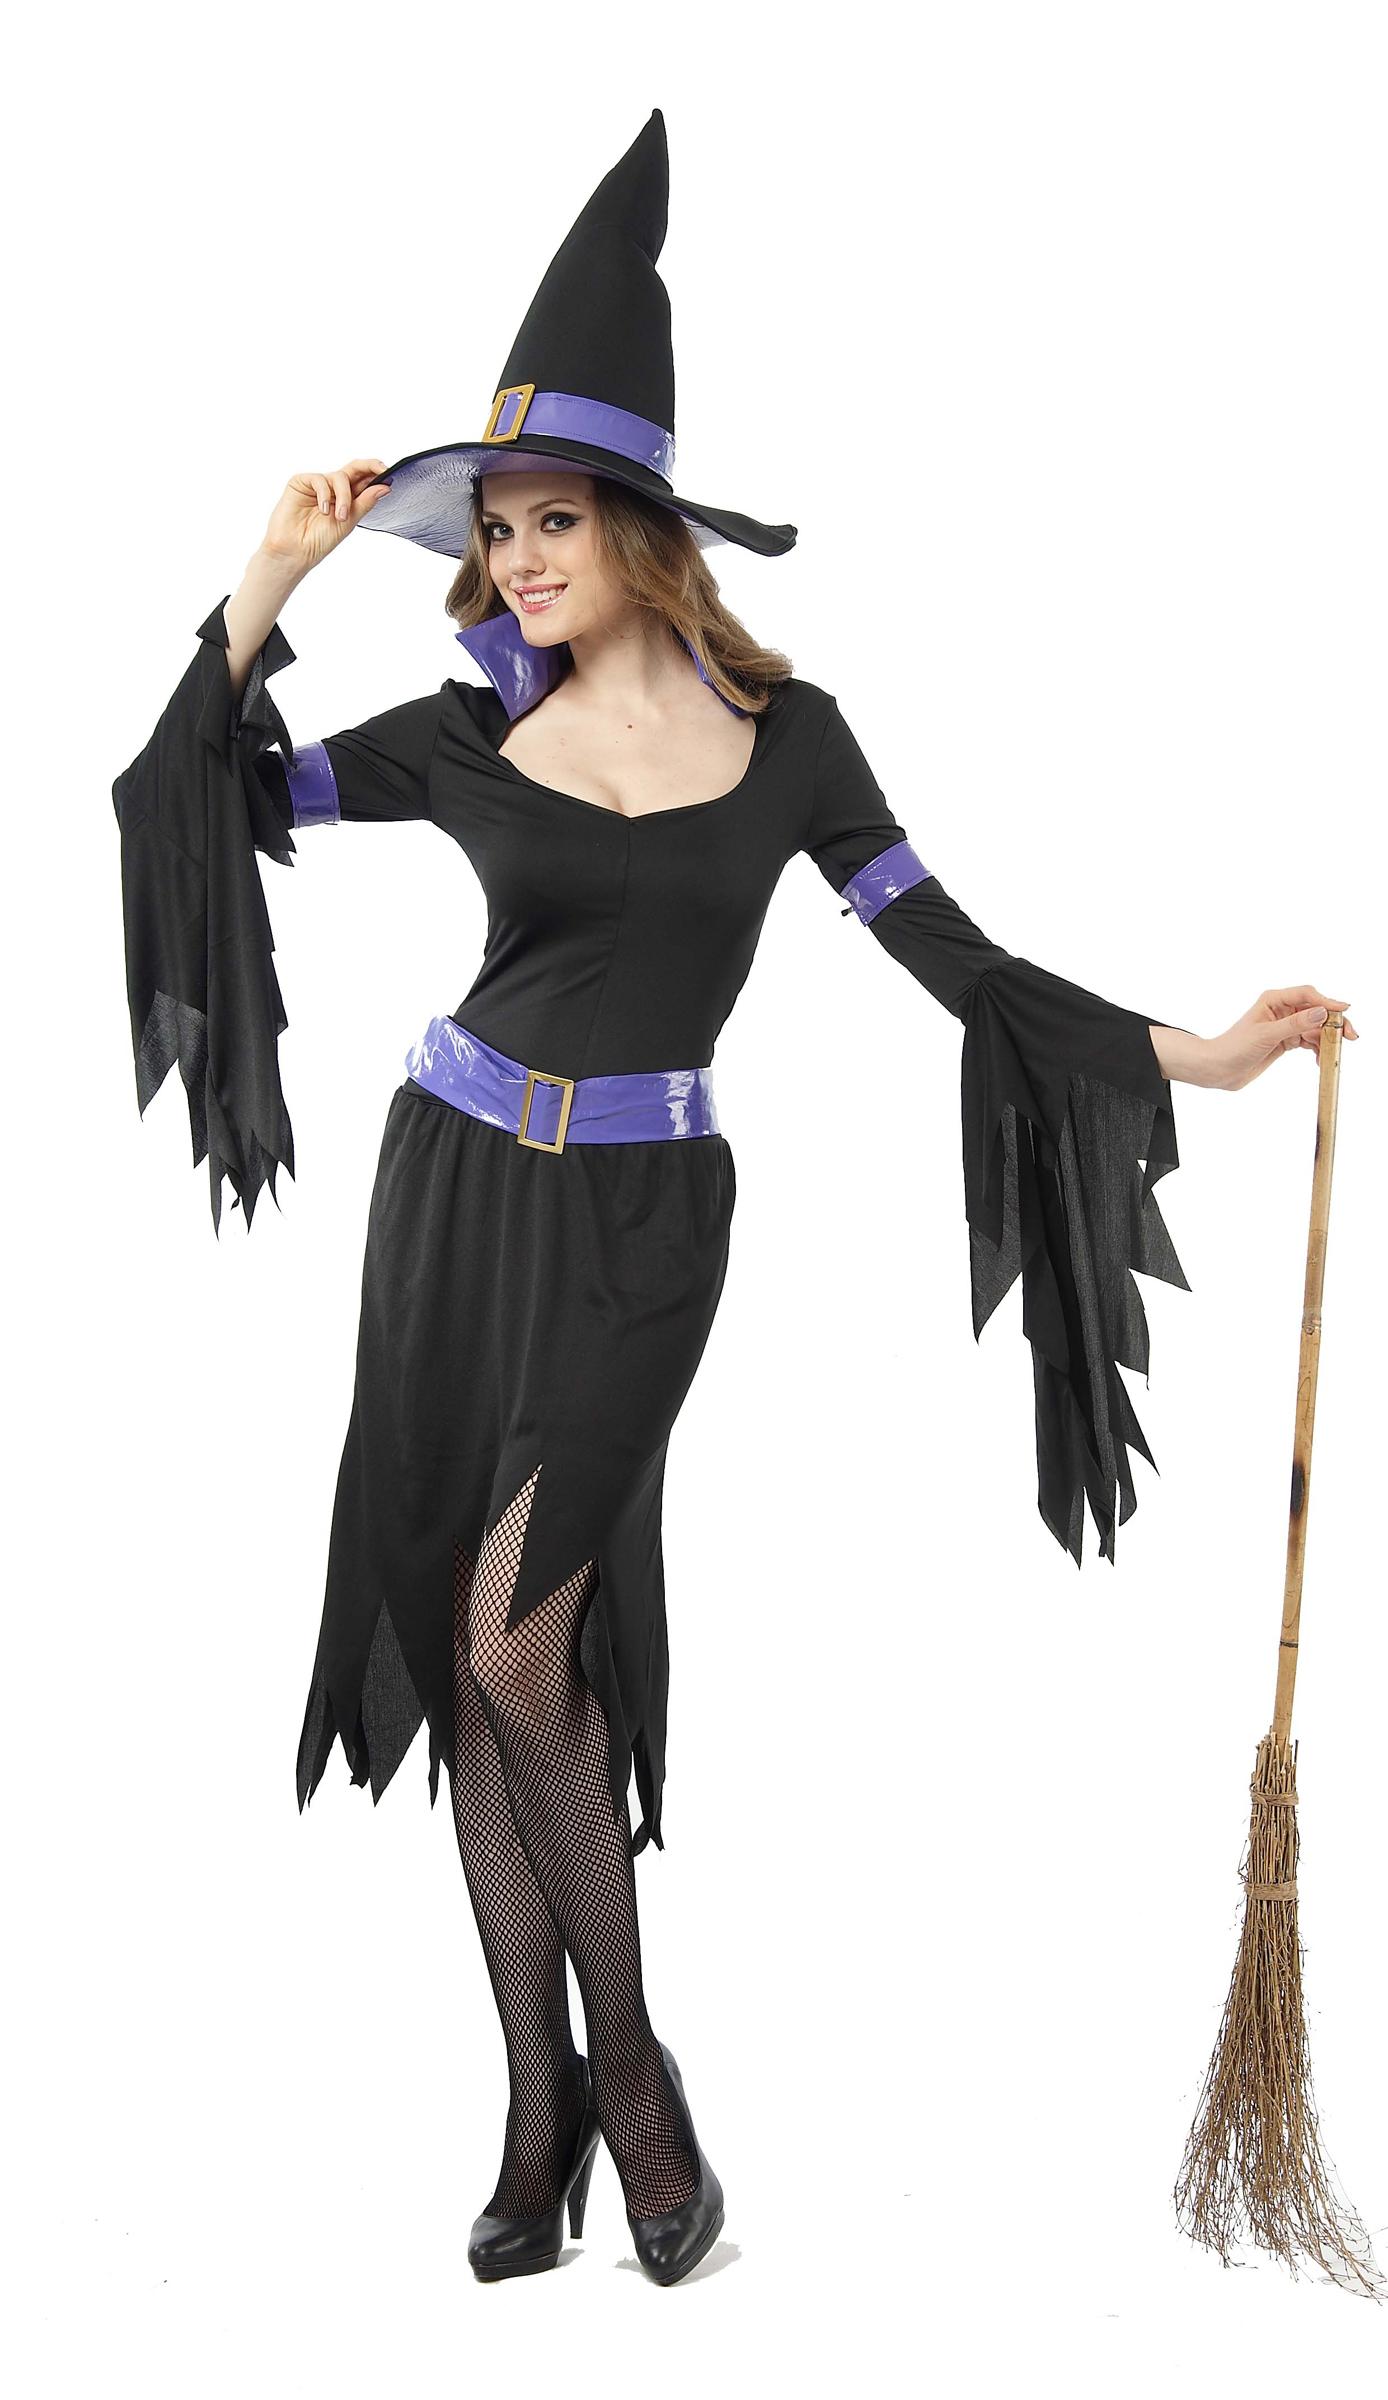 deguisement-de-sorciere-glamour-femme-halloween